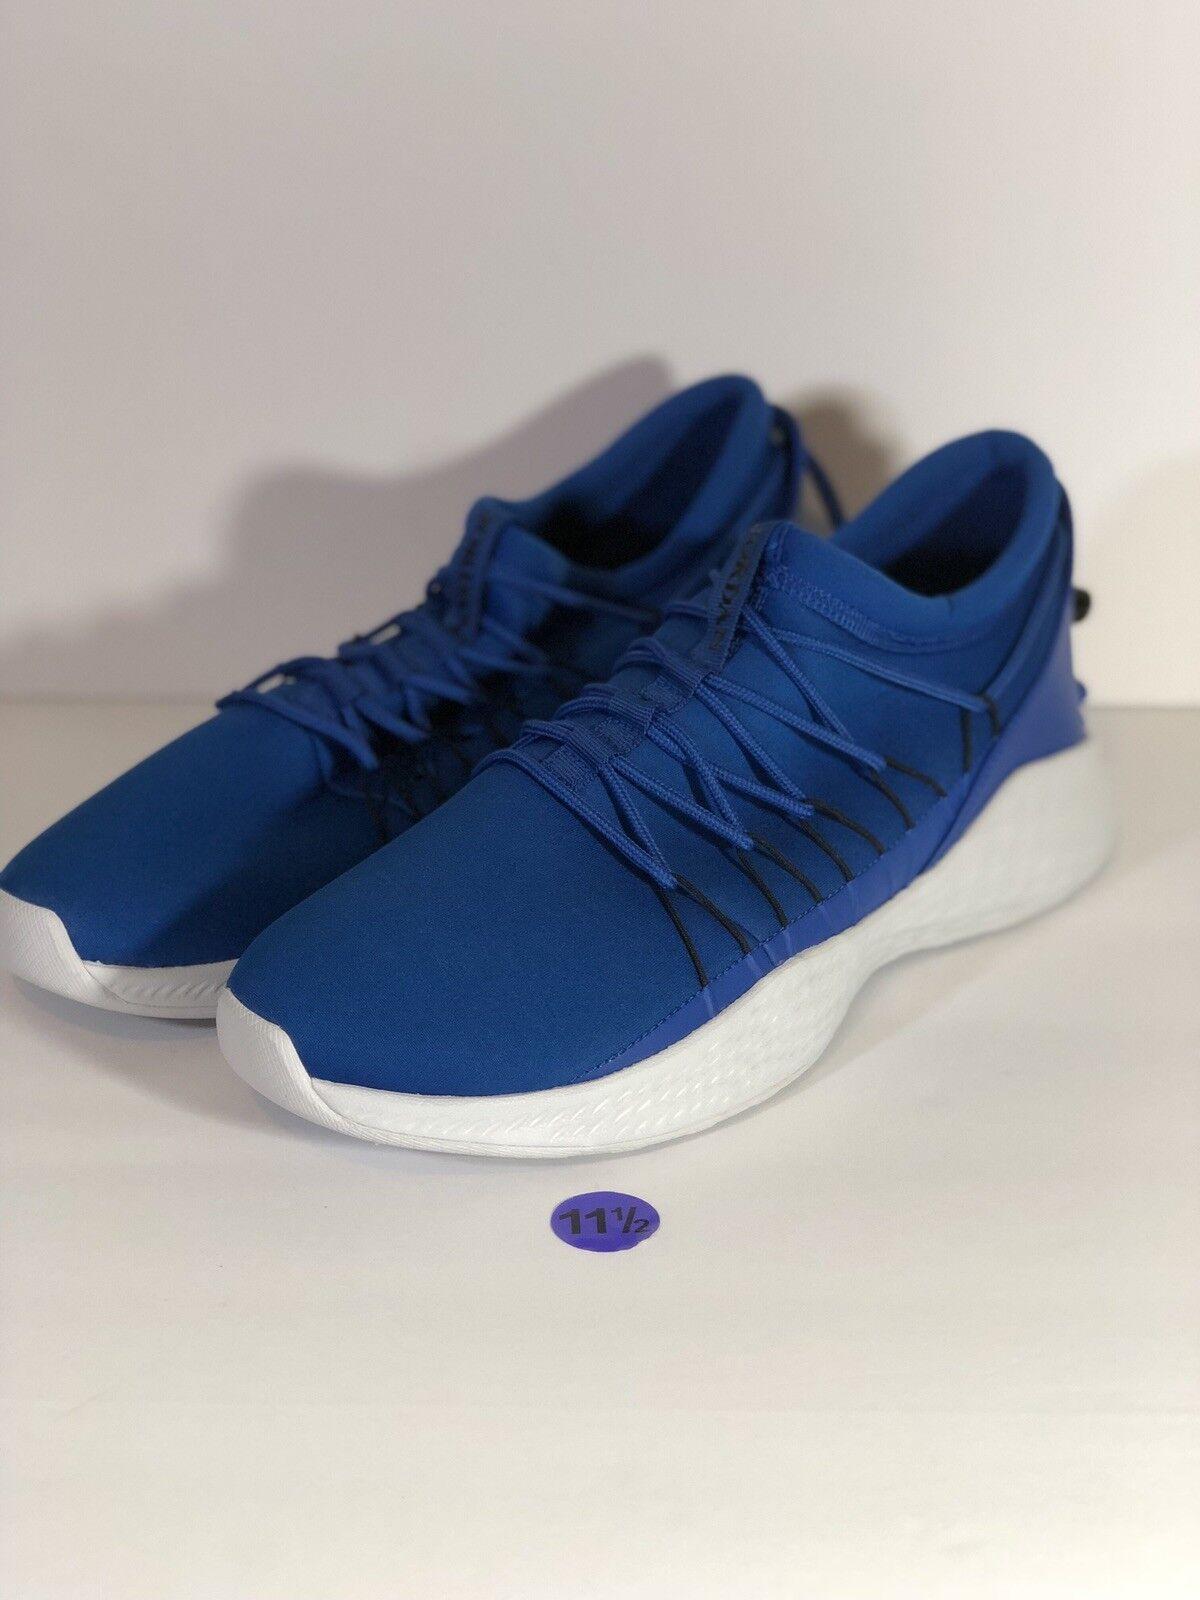 Nike Mens shoes Jordan Formula 23 Toggle 908859-400 Team Royal Black Platinum NEW